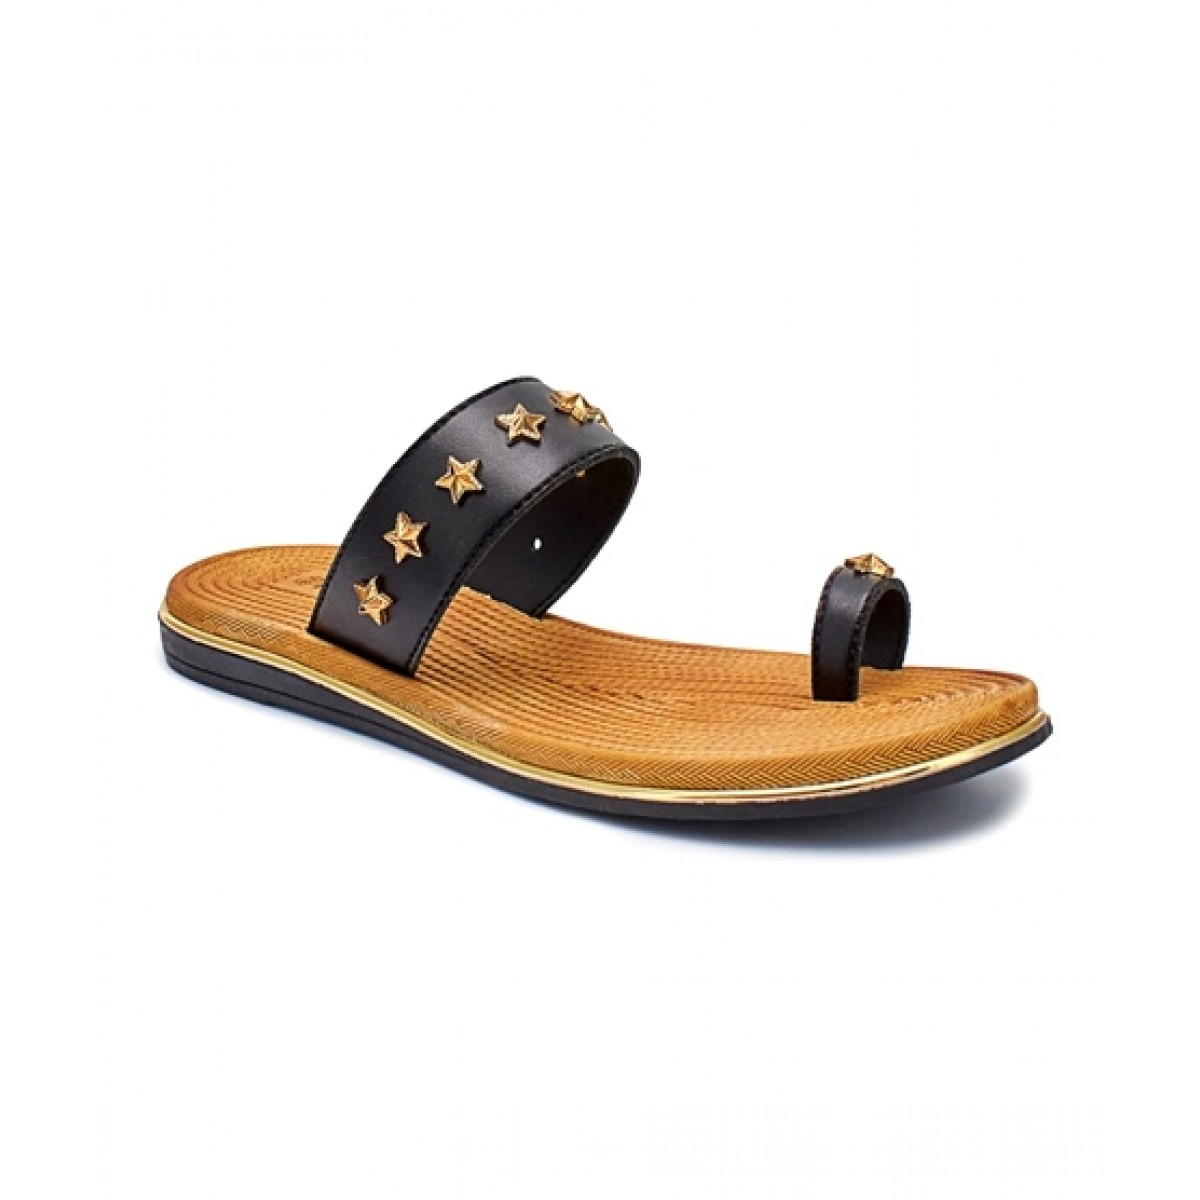 Servis Ndure Toe Ring Chappal For Women Black (ND-CU-0066)